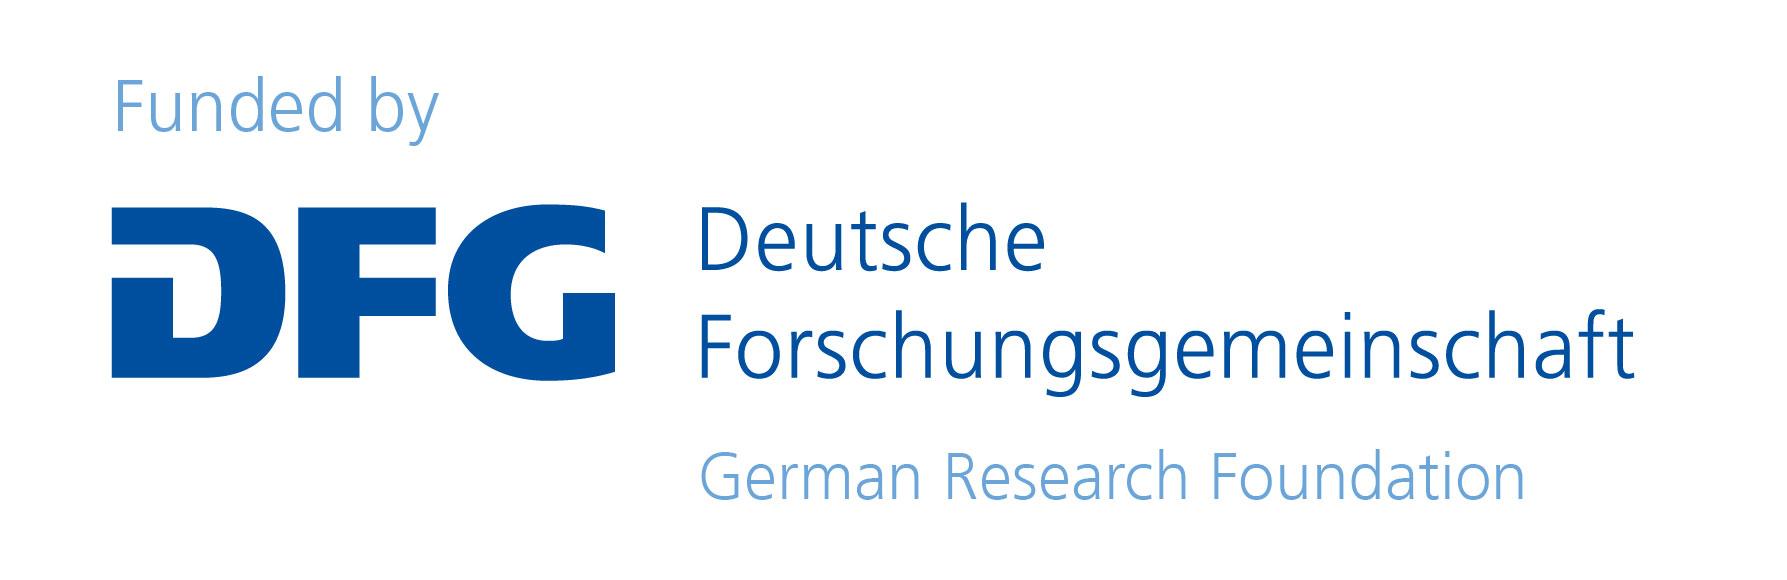 Funded By DFG, Deutsche Forschungsgemeinschaft, German Research Foundation.